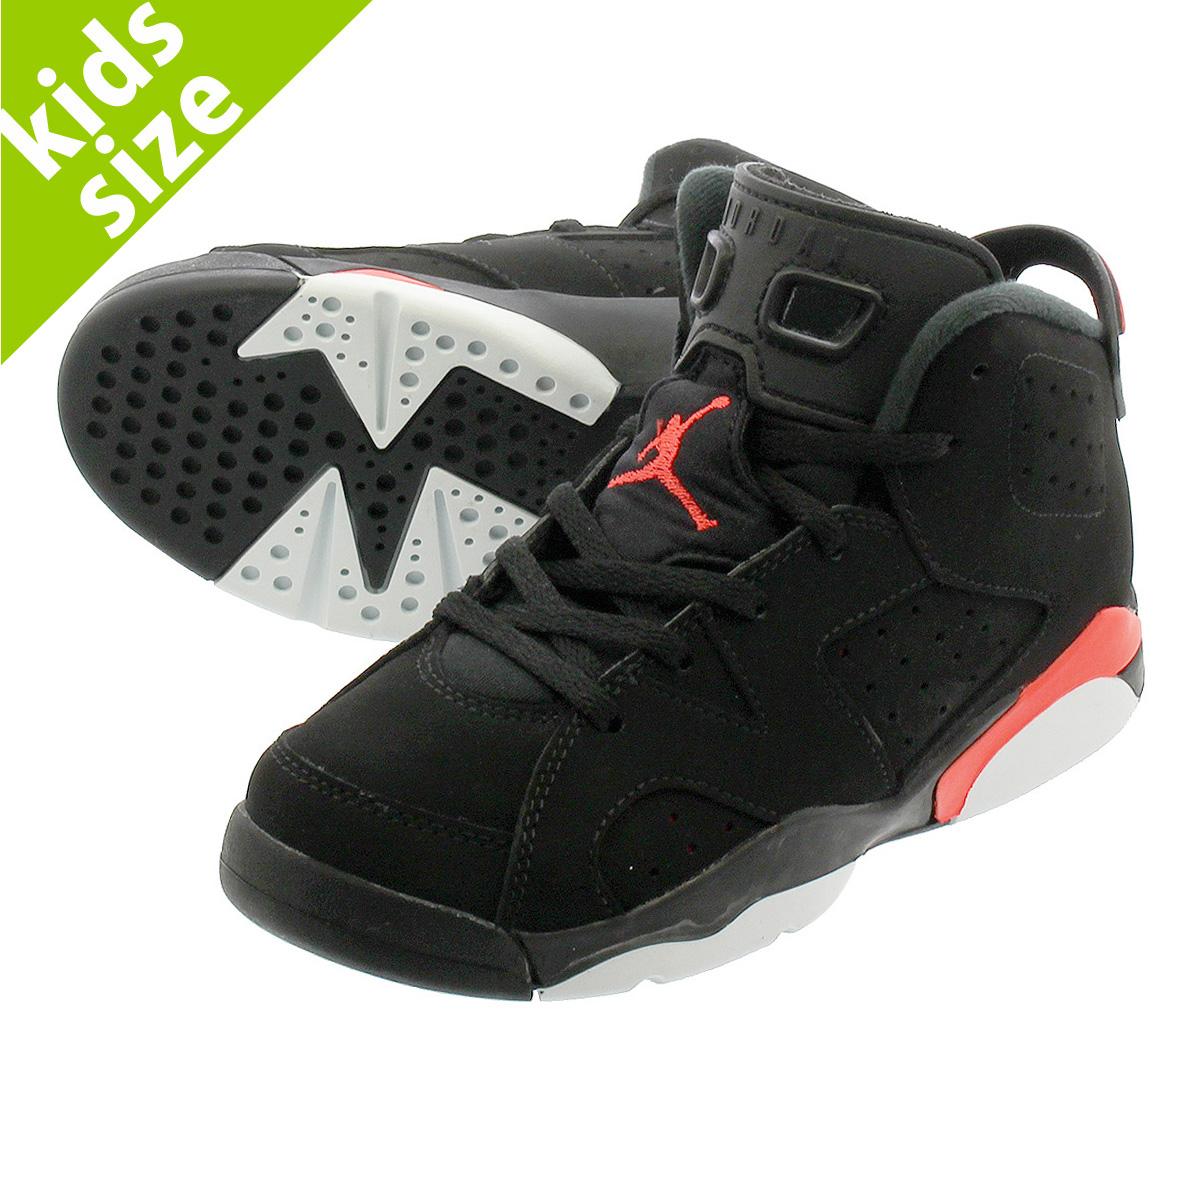 6f60530b12a NIKE AIR JORDAN 6 RETRO BP Nike Air Jordan 6 nostalgic BP BLACK INFRARED  384